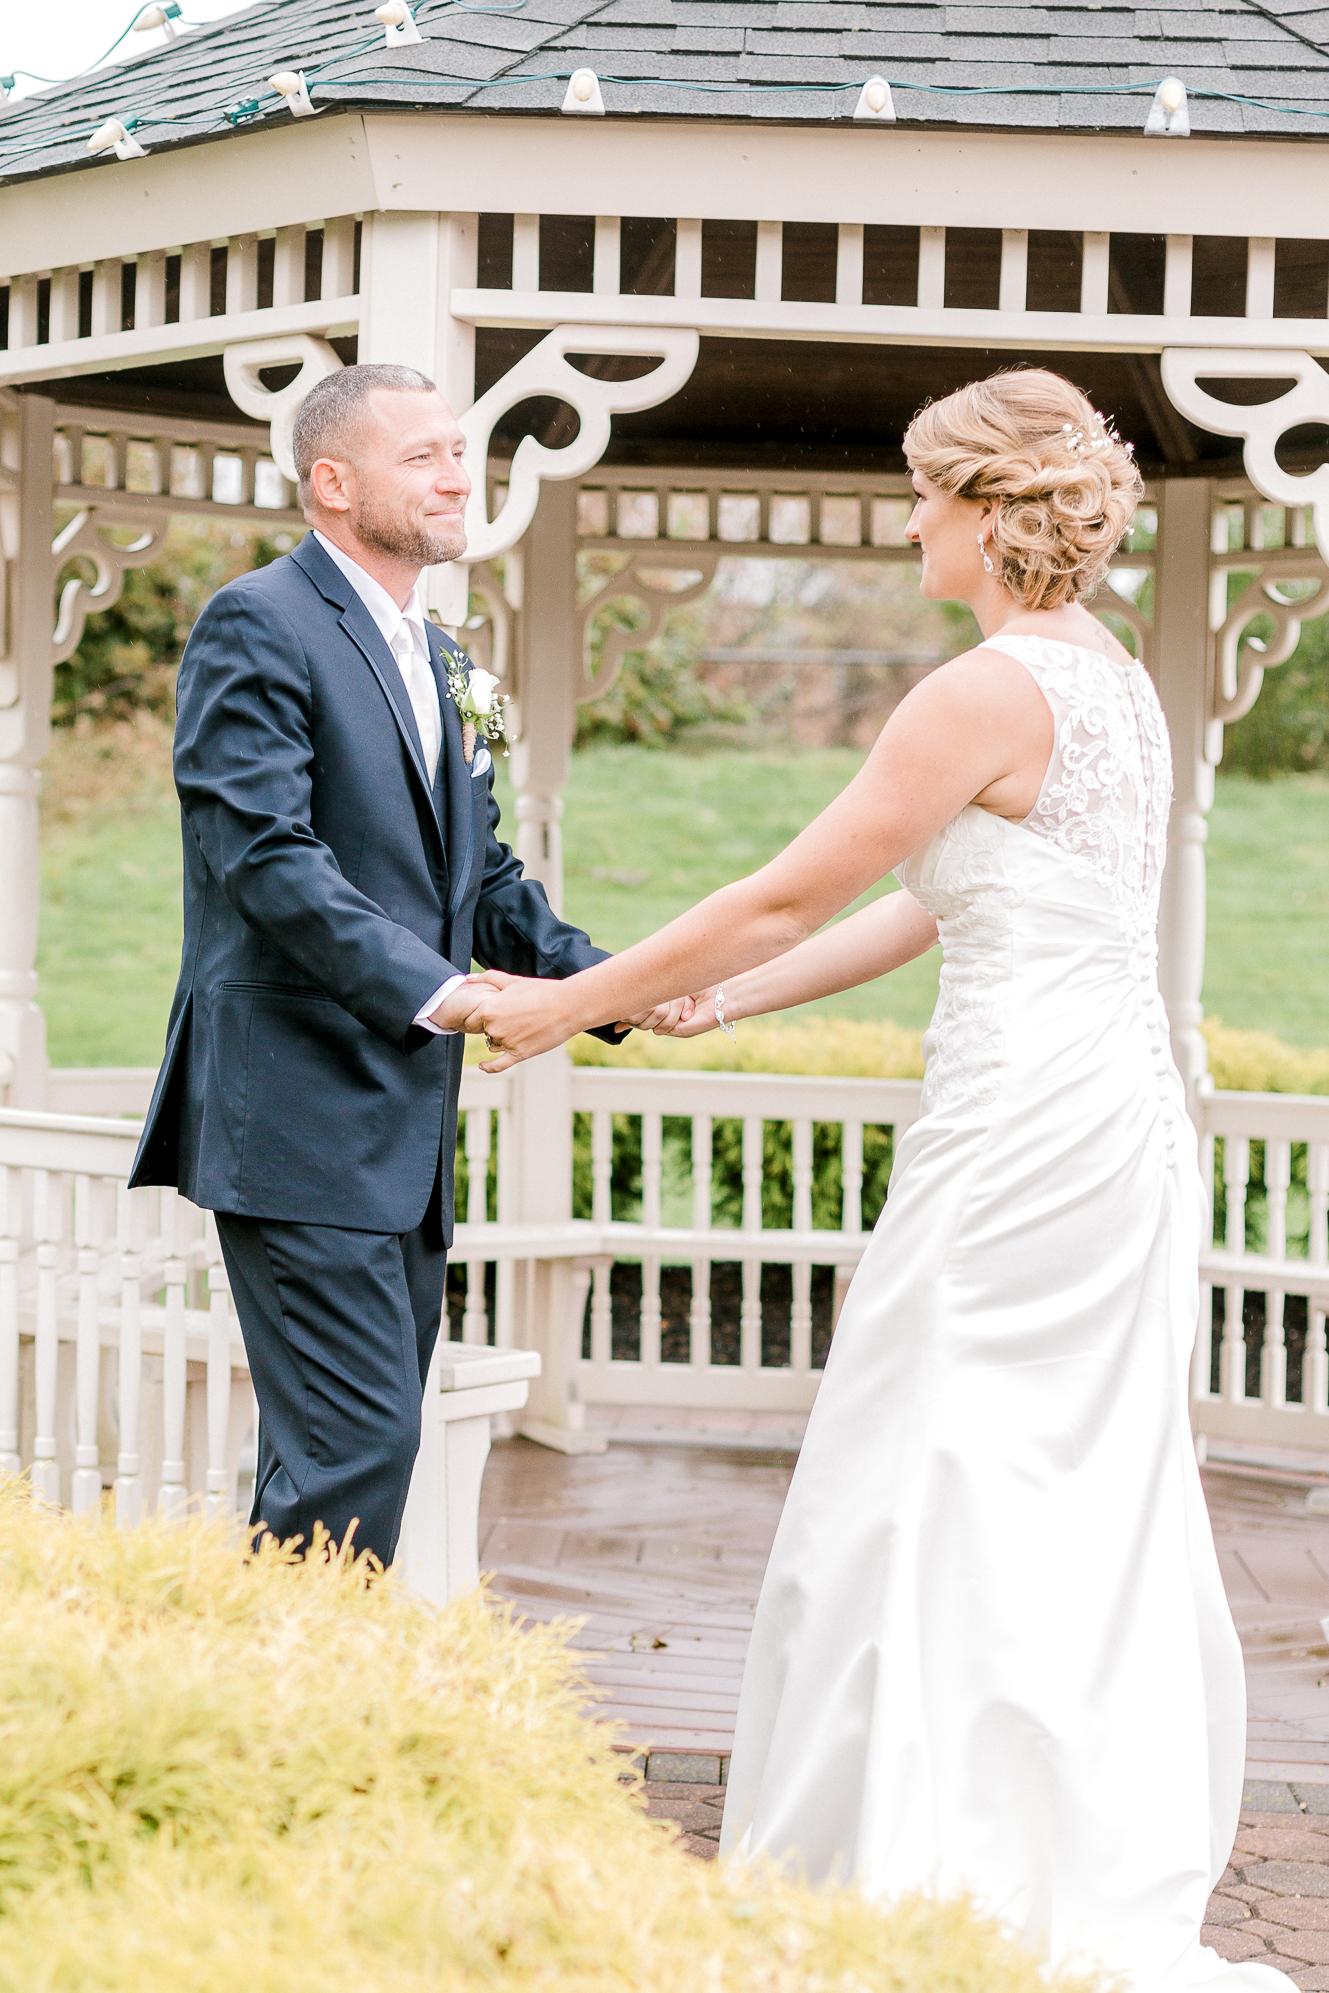 Pennsylvania October Fall Lehigh Valley wedding and lifestyle photographer Lytle Photo Co (41 of 167).jpg